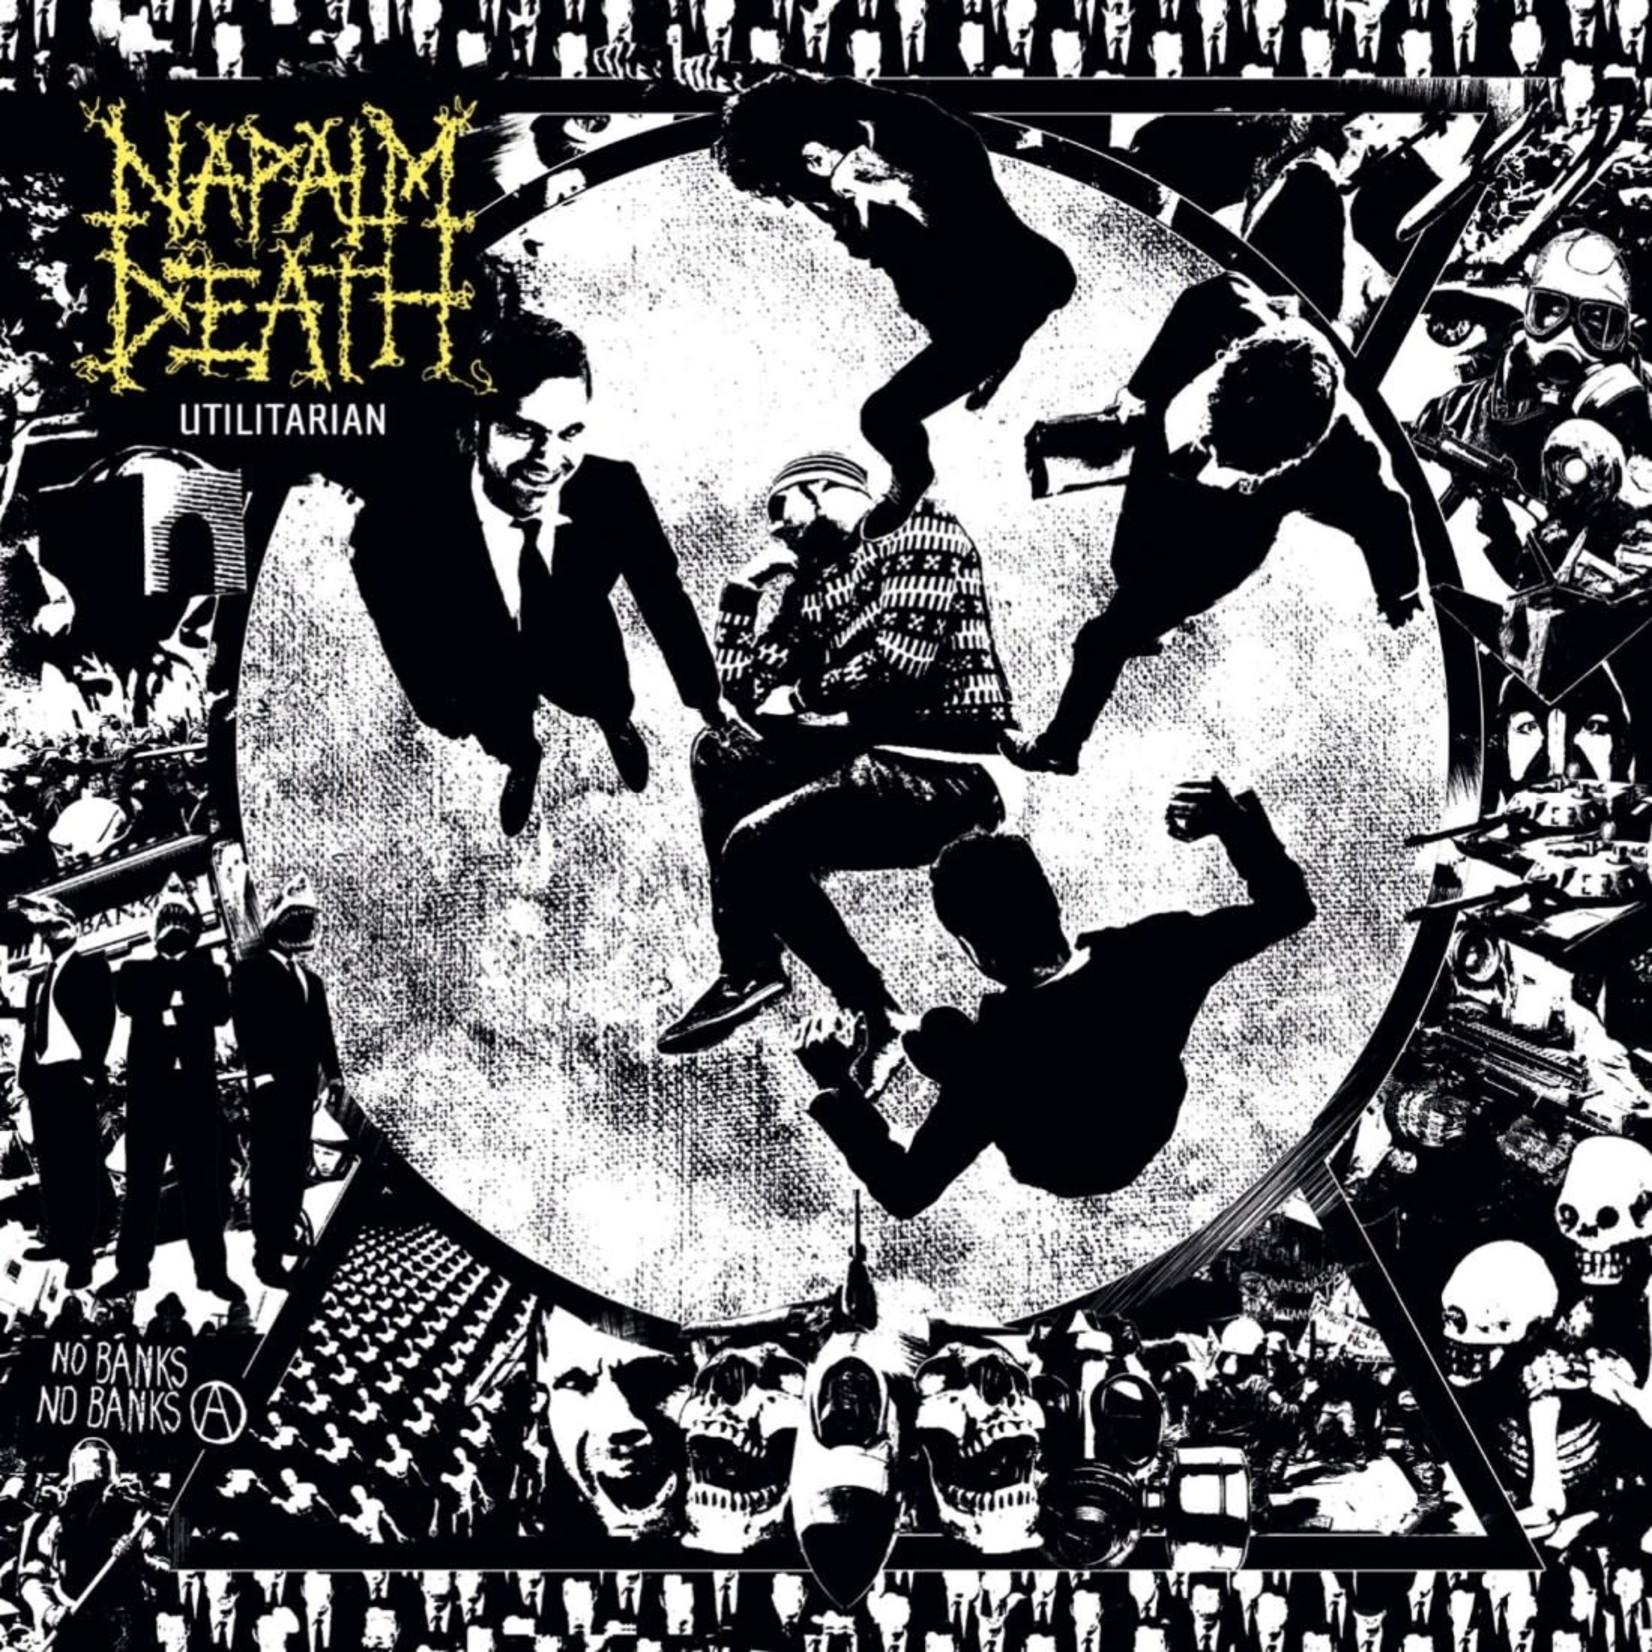 [New] Napalm Death: Utilitarian